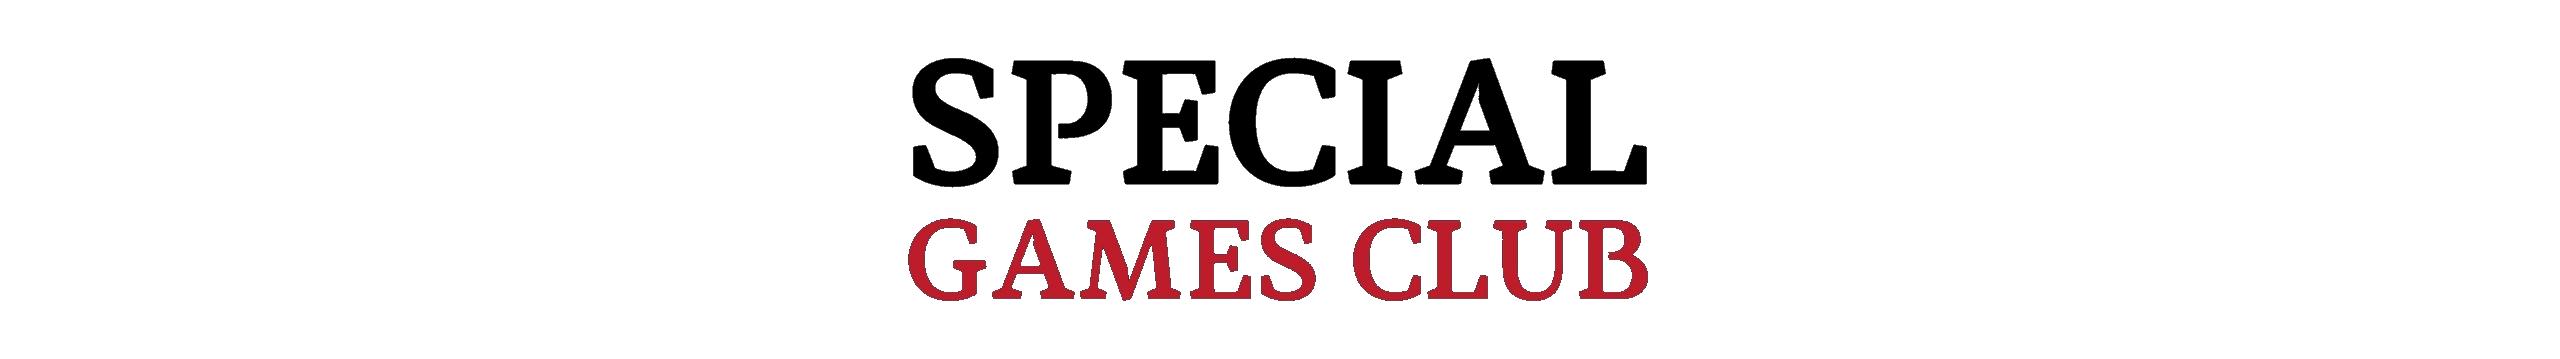 Special Games Club